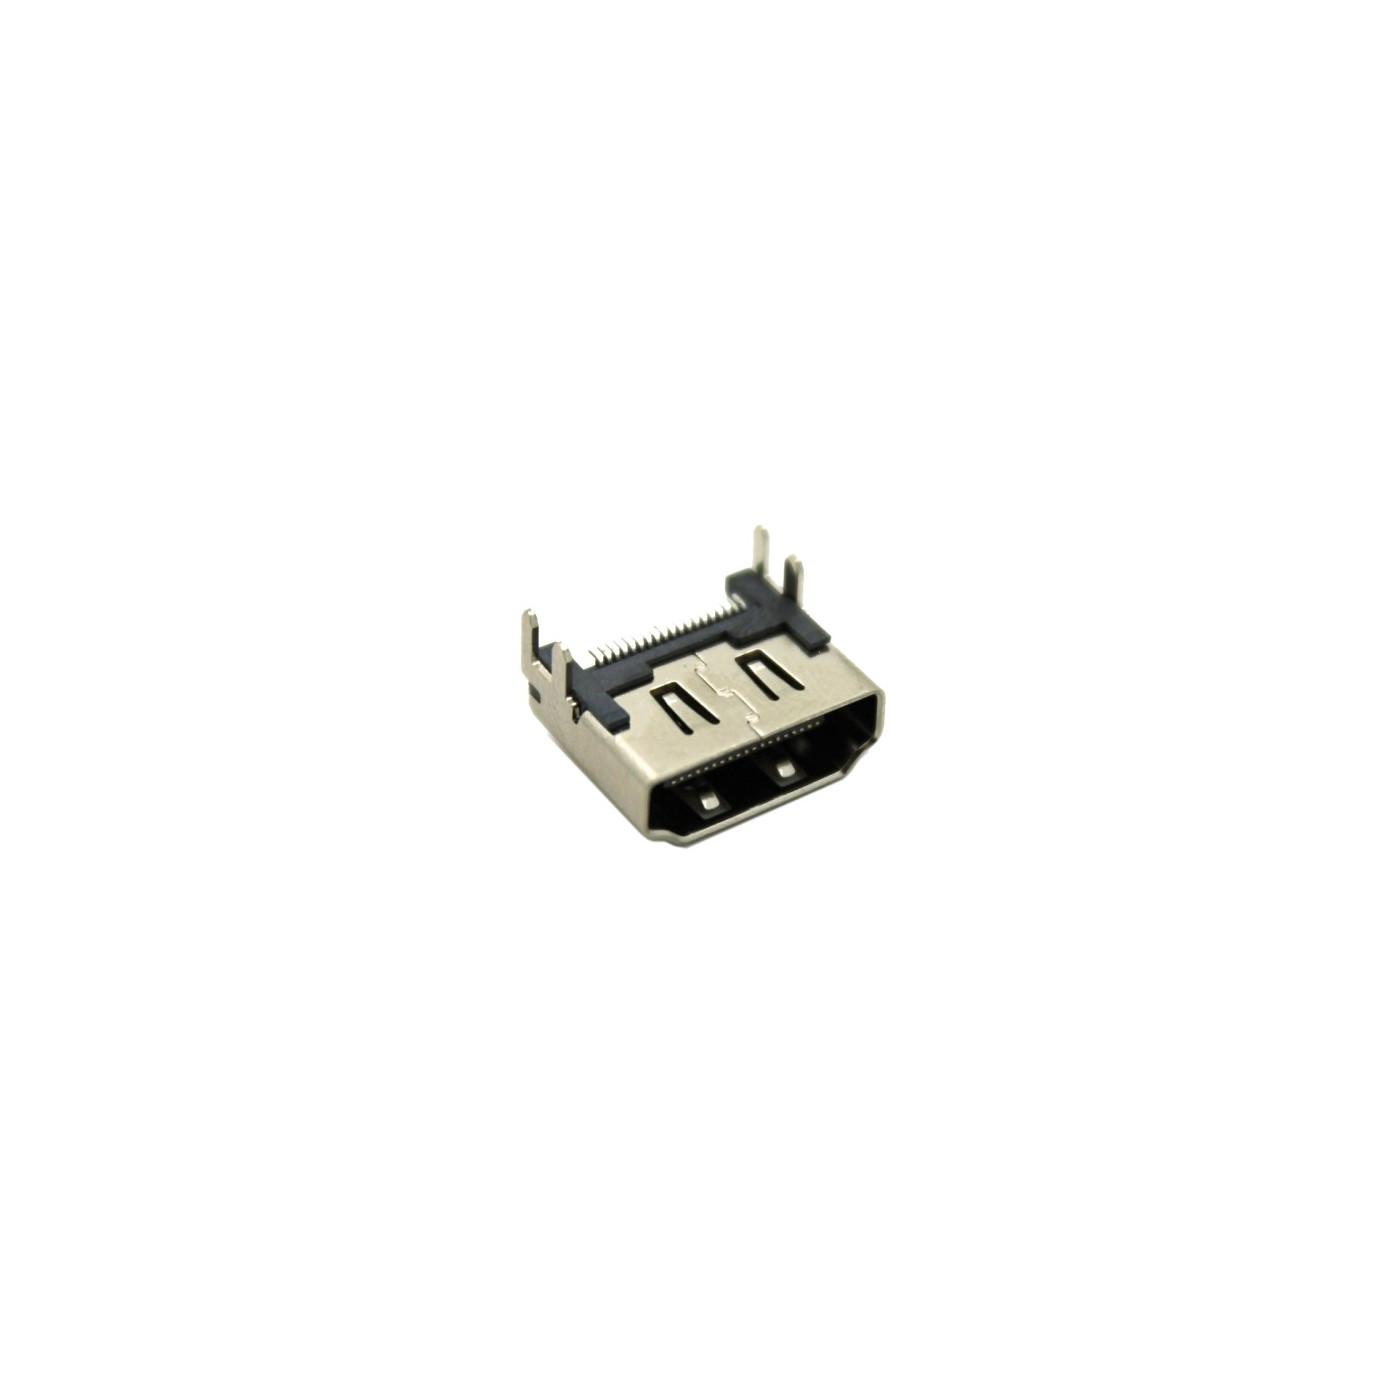 CONECTOR HDMI PARA SONY PLAYSTATION 4 PS4 SOCKET PORT